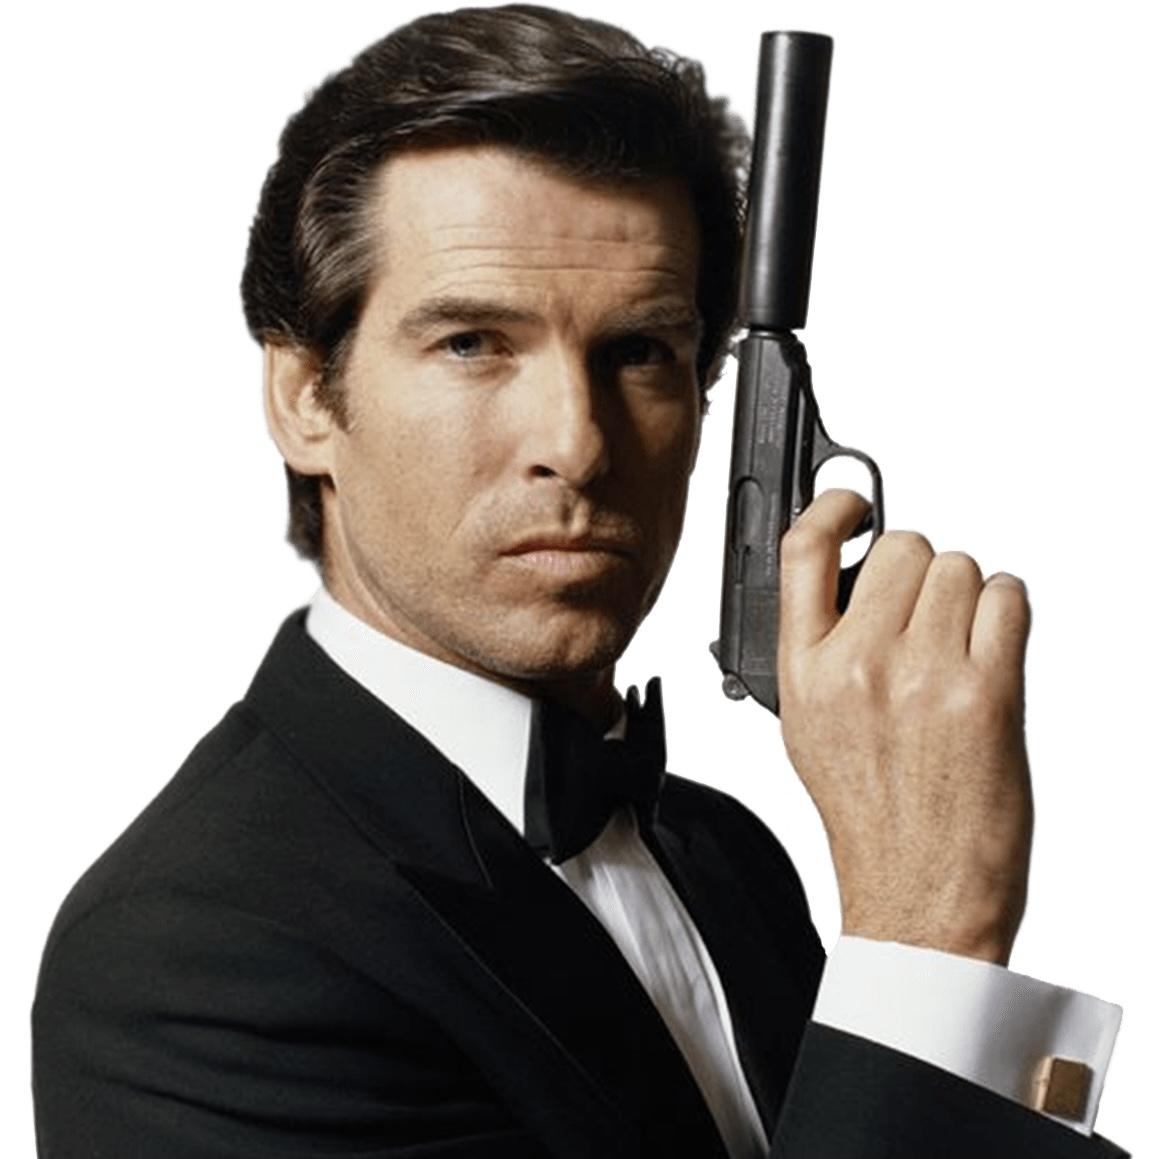 https://static.wikia.nocookie.net/jamesbond/images/d/dc/James_Bond_%28Pierce_Brosnan%29_-_Profile.jpg/revision/latest?cb=20130506224906